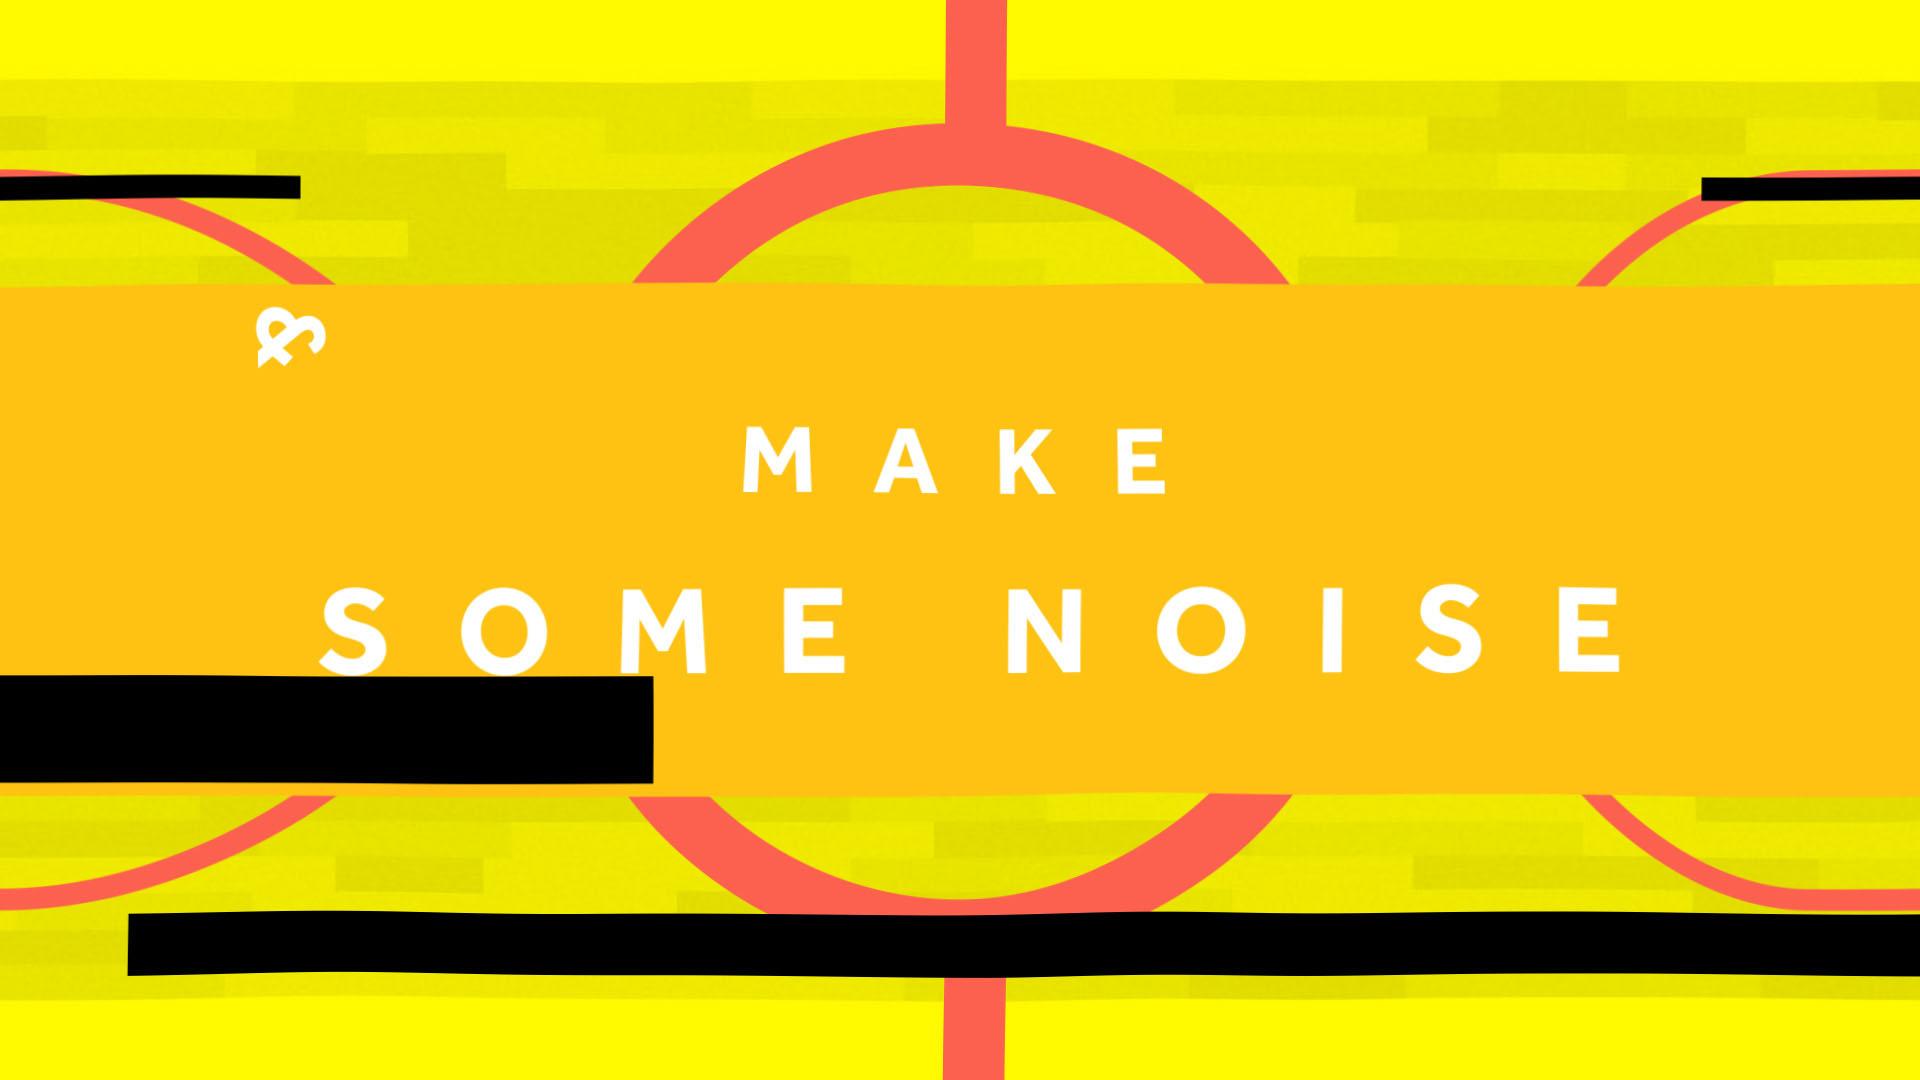 3. Make_Some_Noise (-03-05) (0-00-02-10) copy.jpg